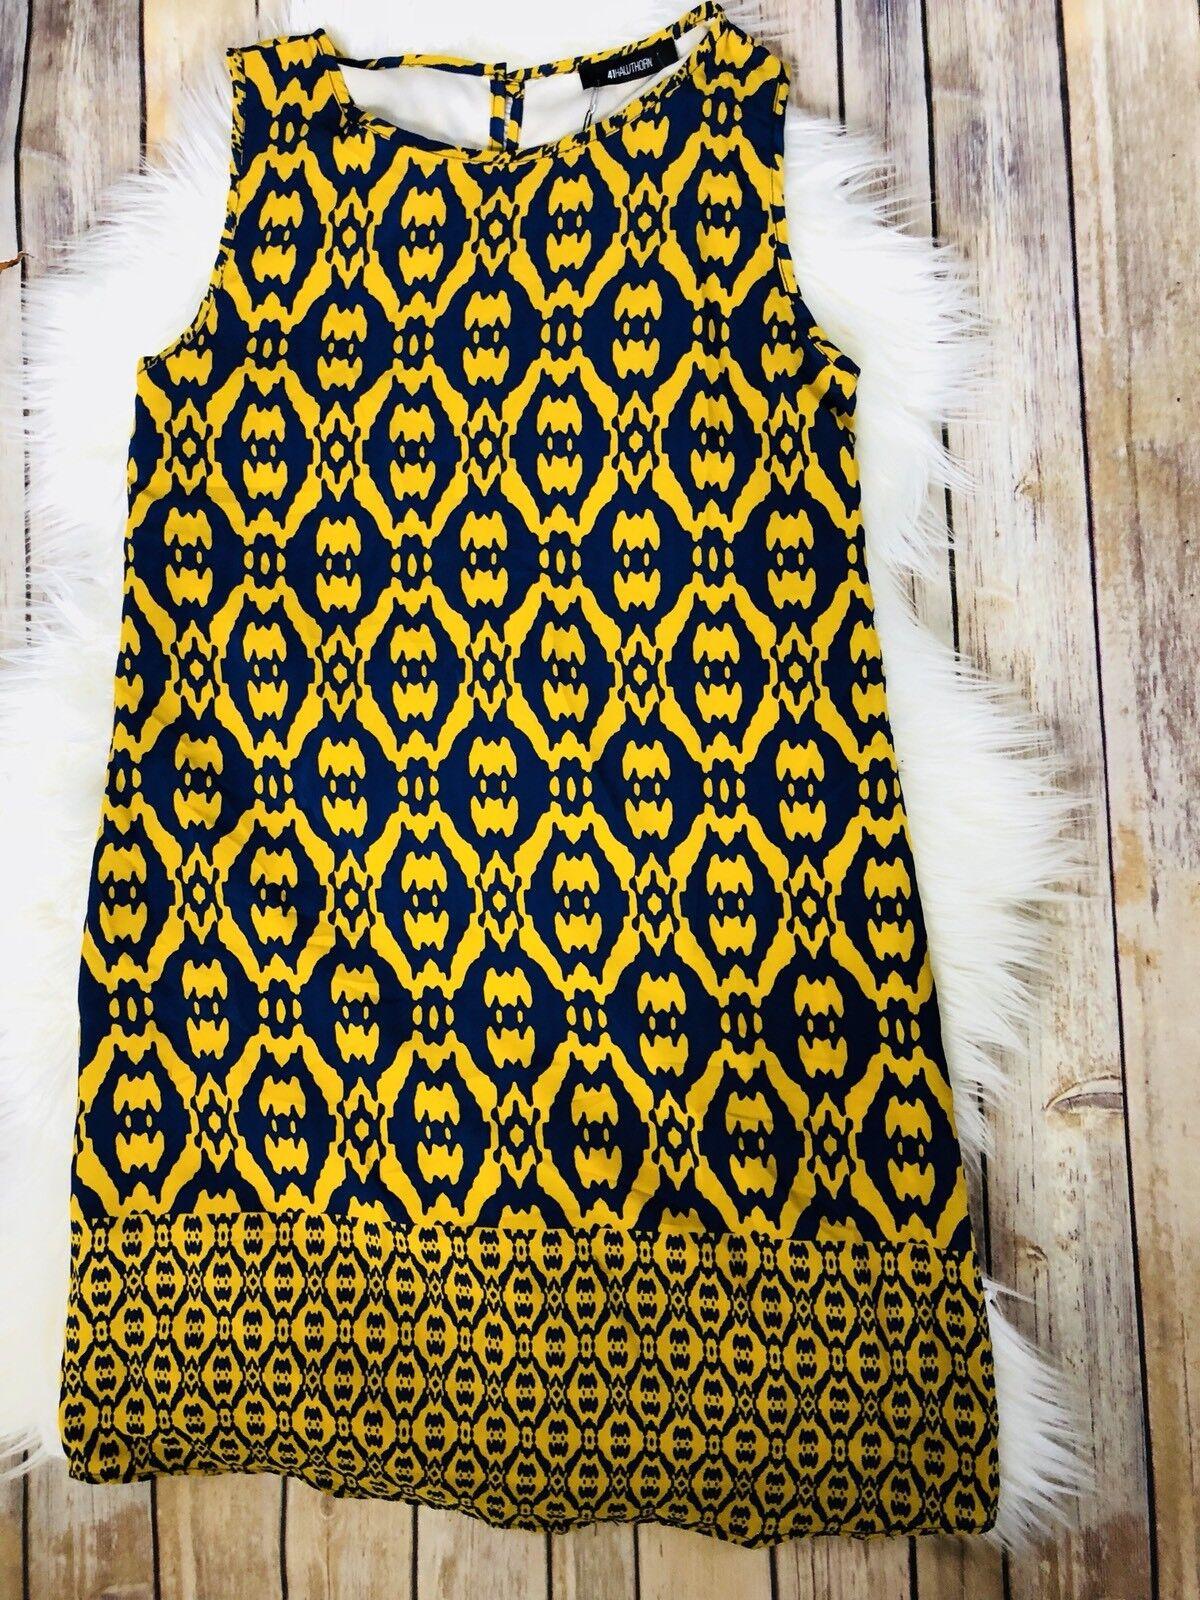 Stirch Fix 41Hawthorn bluee Mustard Devan sleeveless Printed Sheath Dress Size S